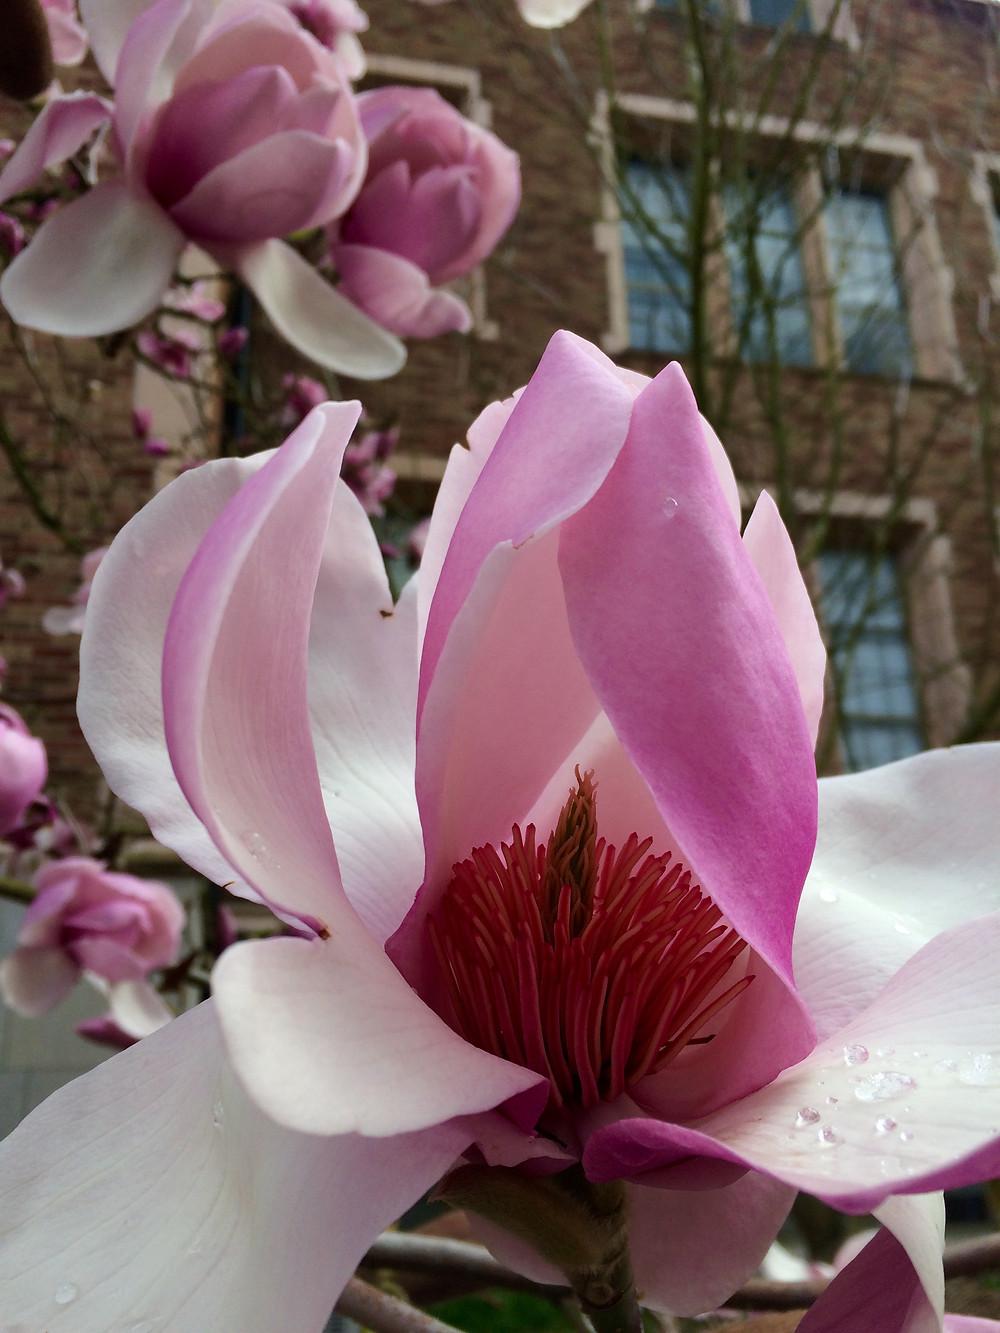 magnolia bud opening